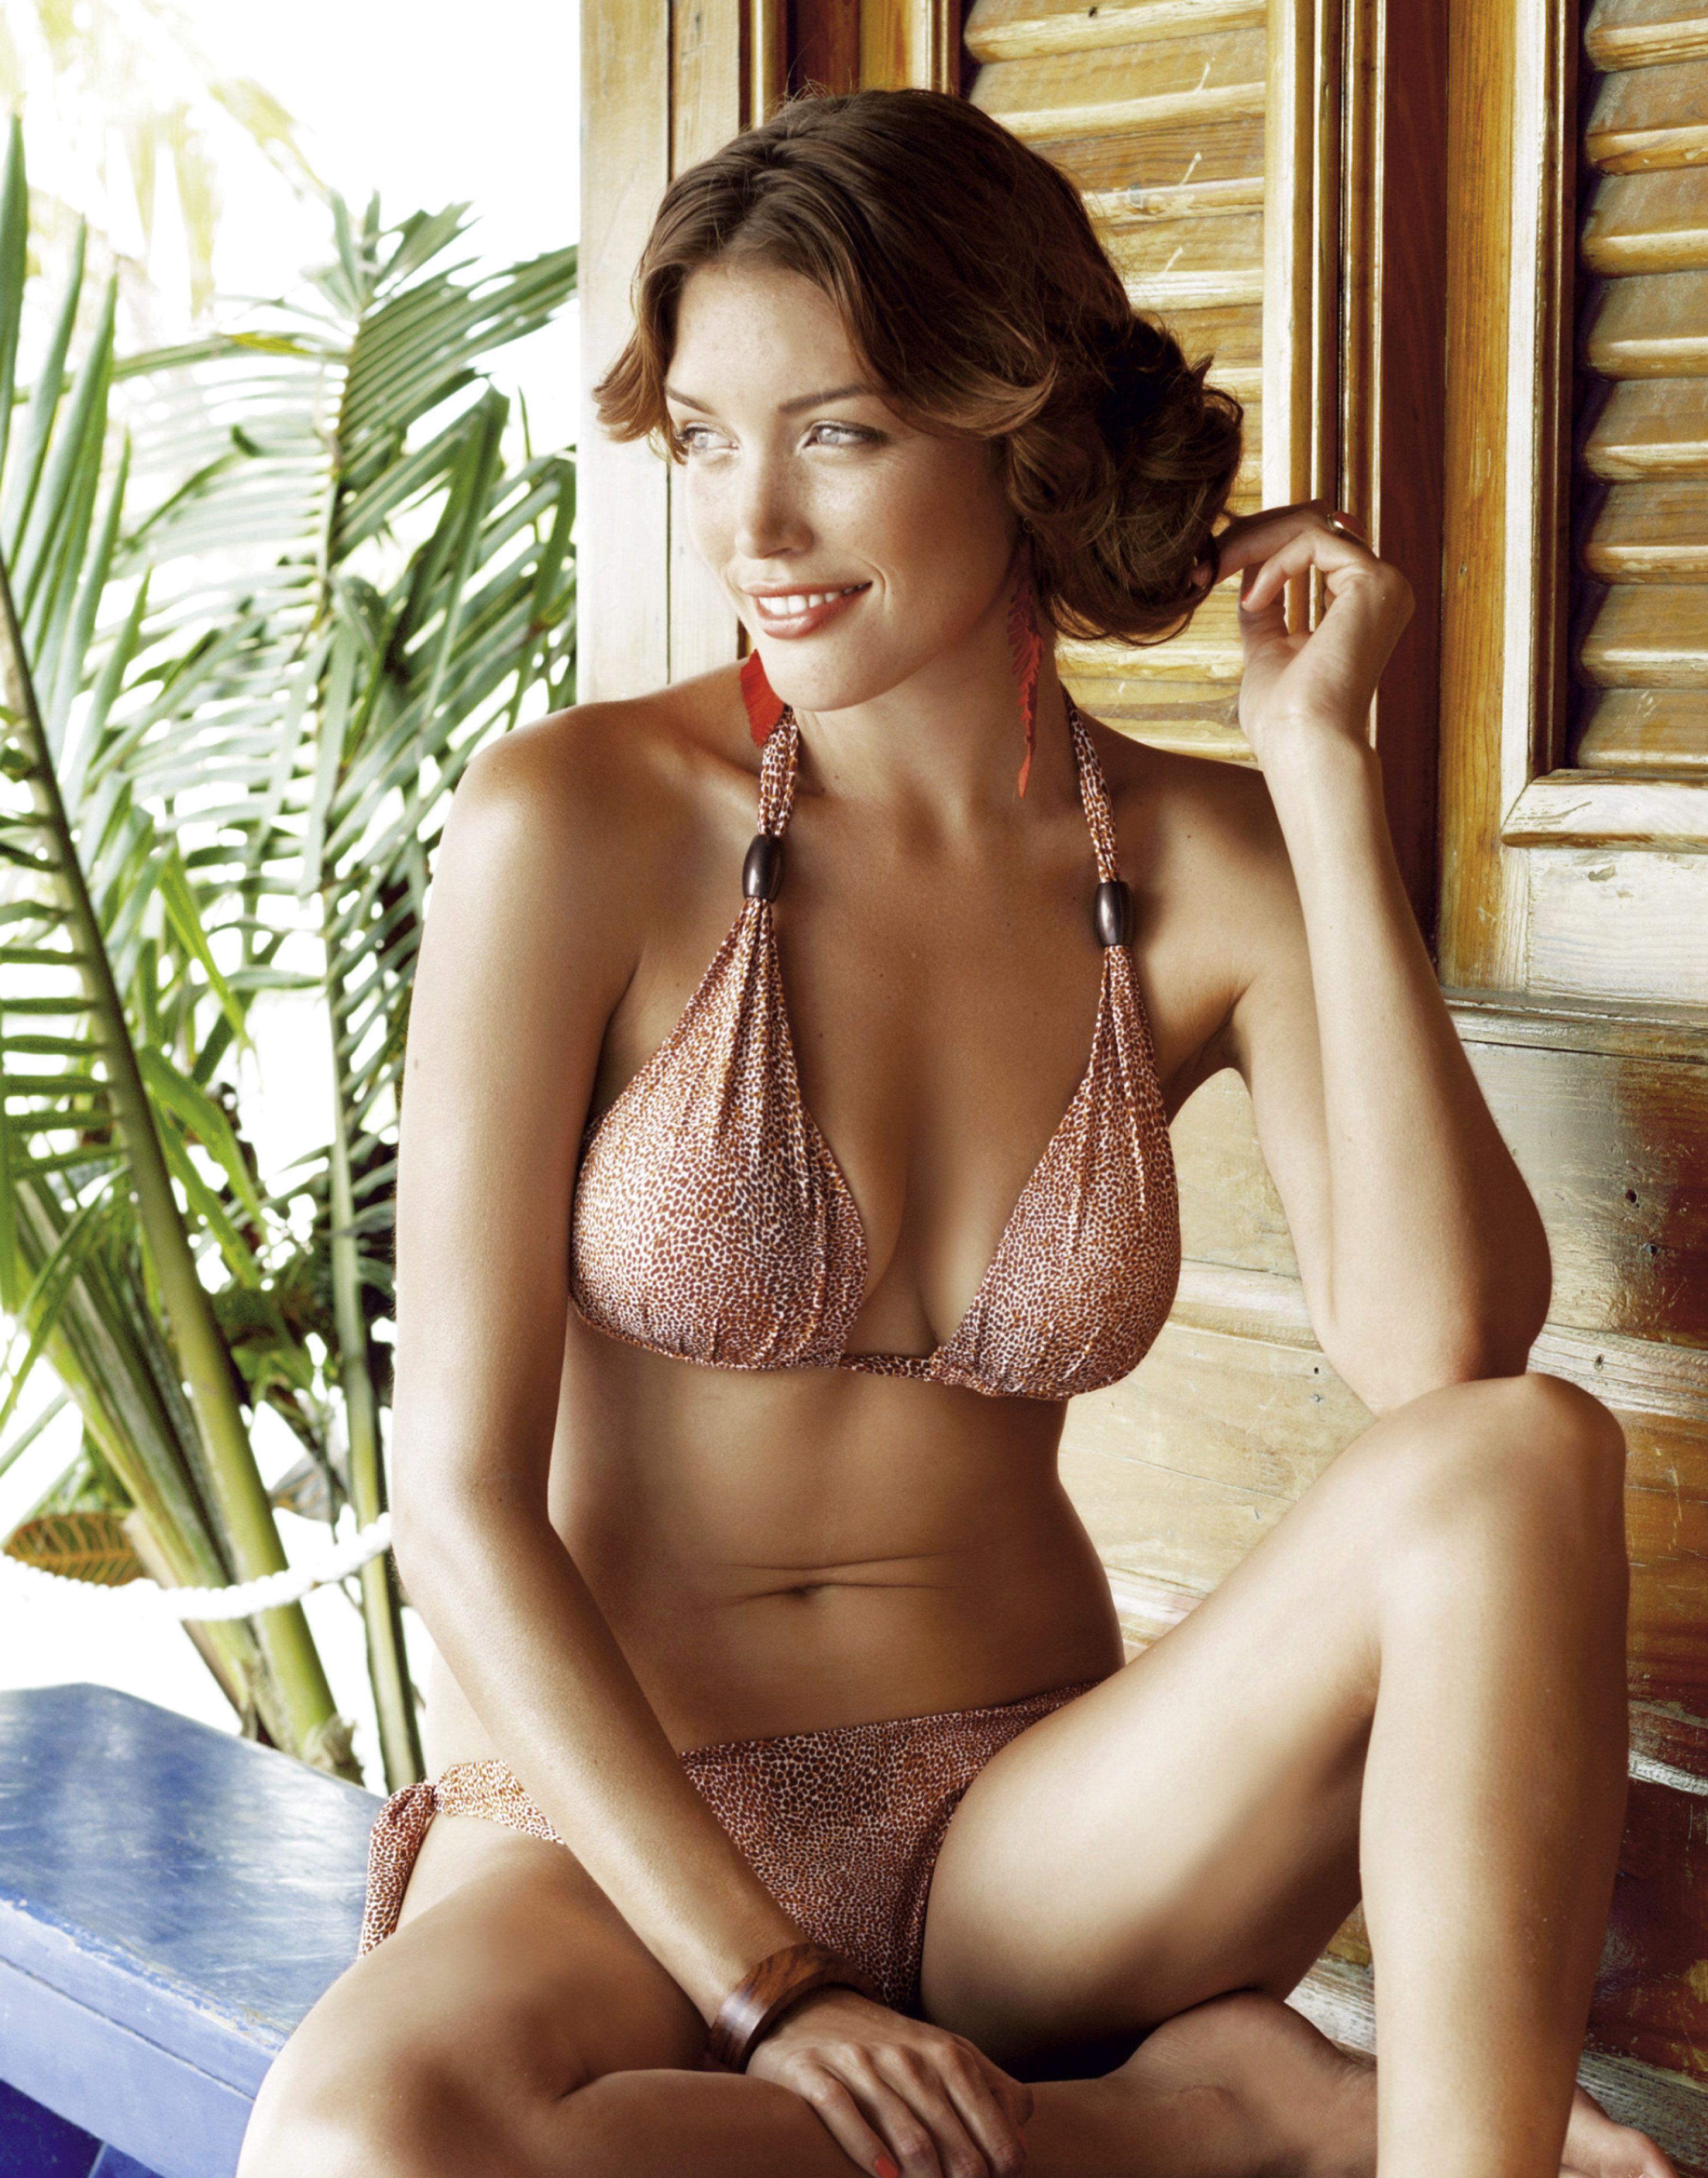 Olivia Garson HQ Passionata Swimwear Lingerie nude (43 photos), Topless Celebrites photos